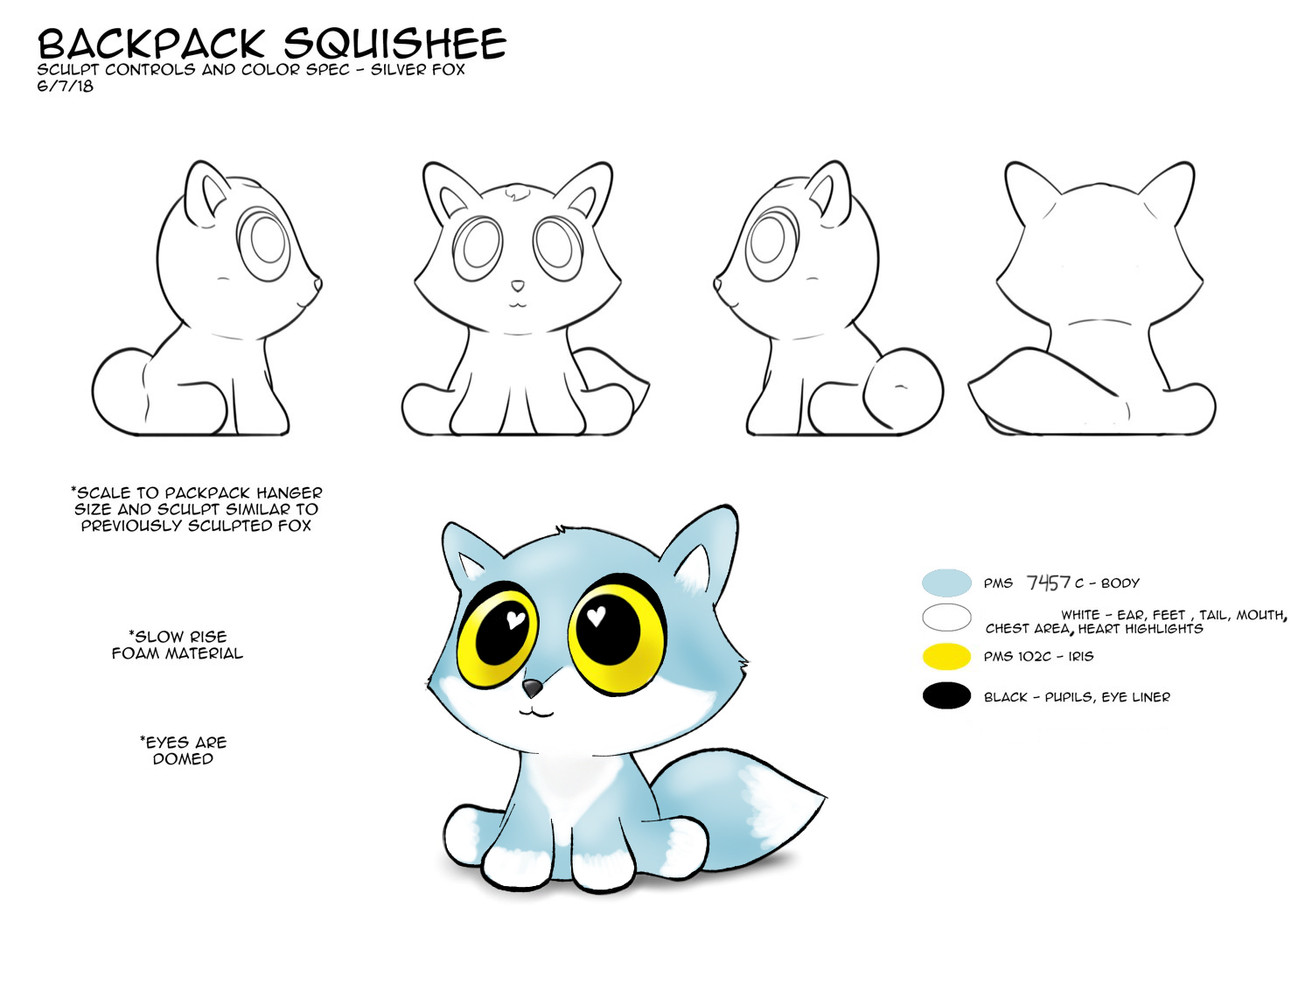 Black Fox Revisions